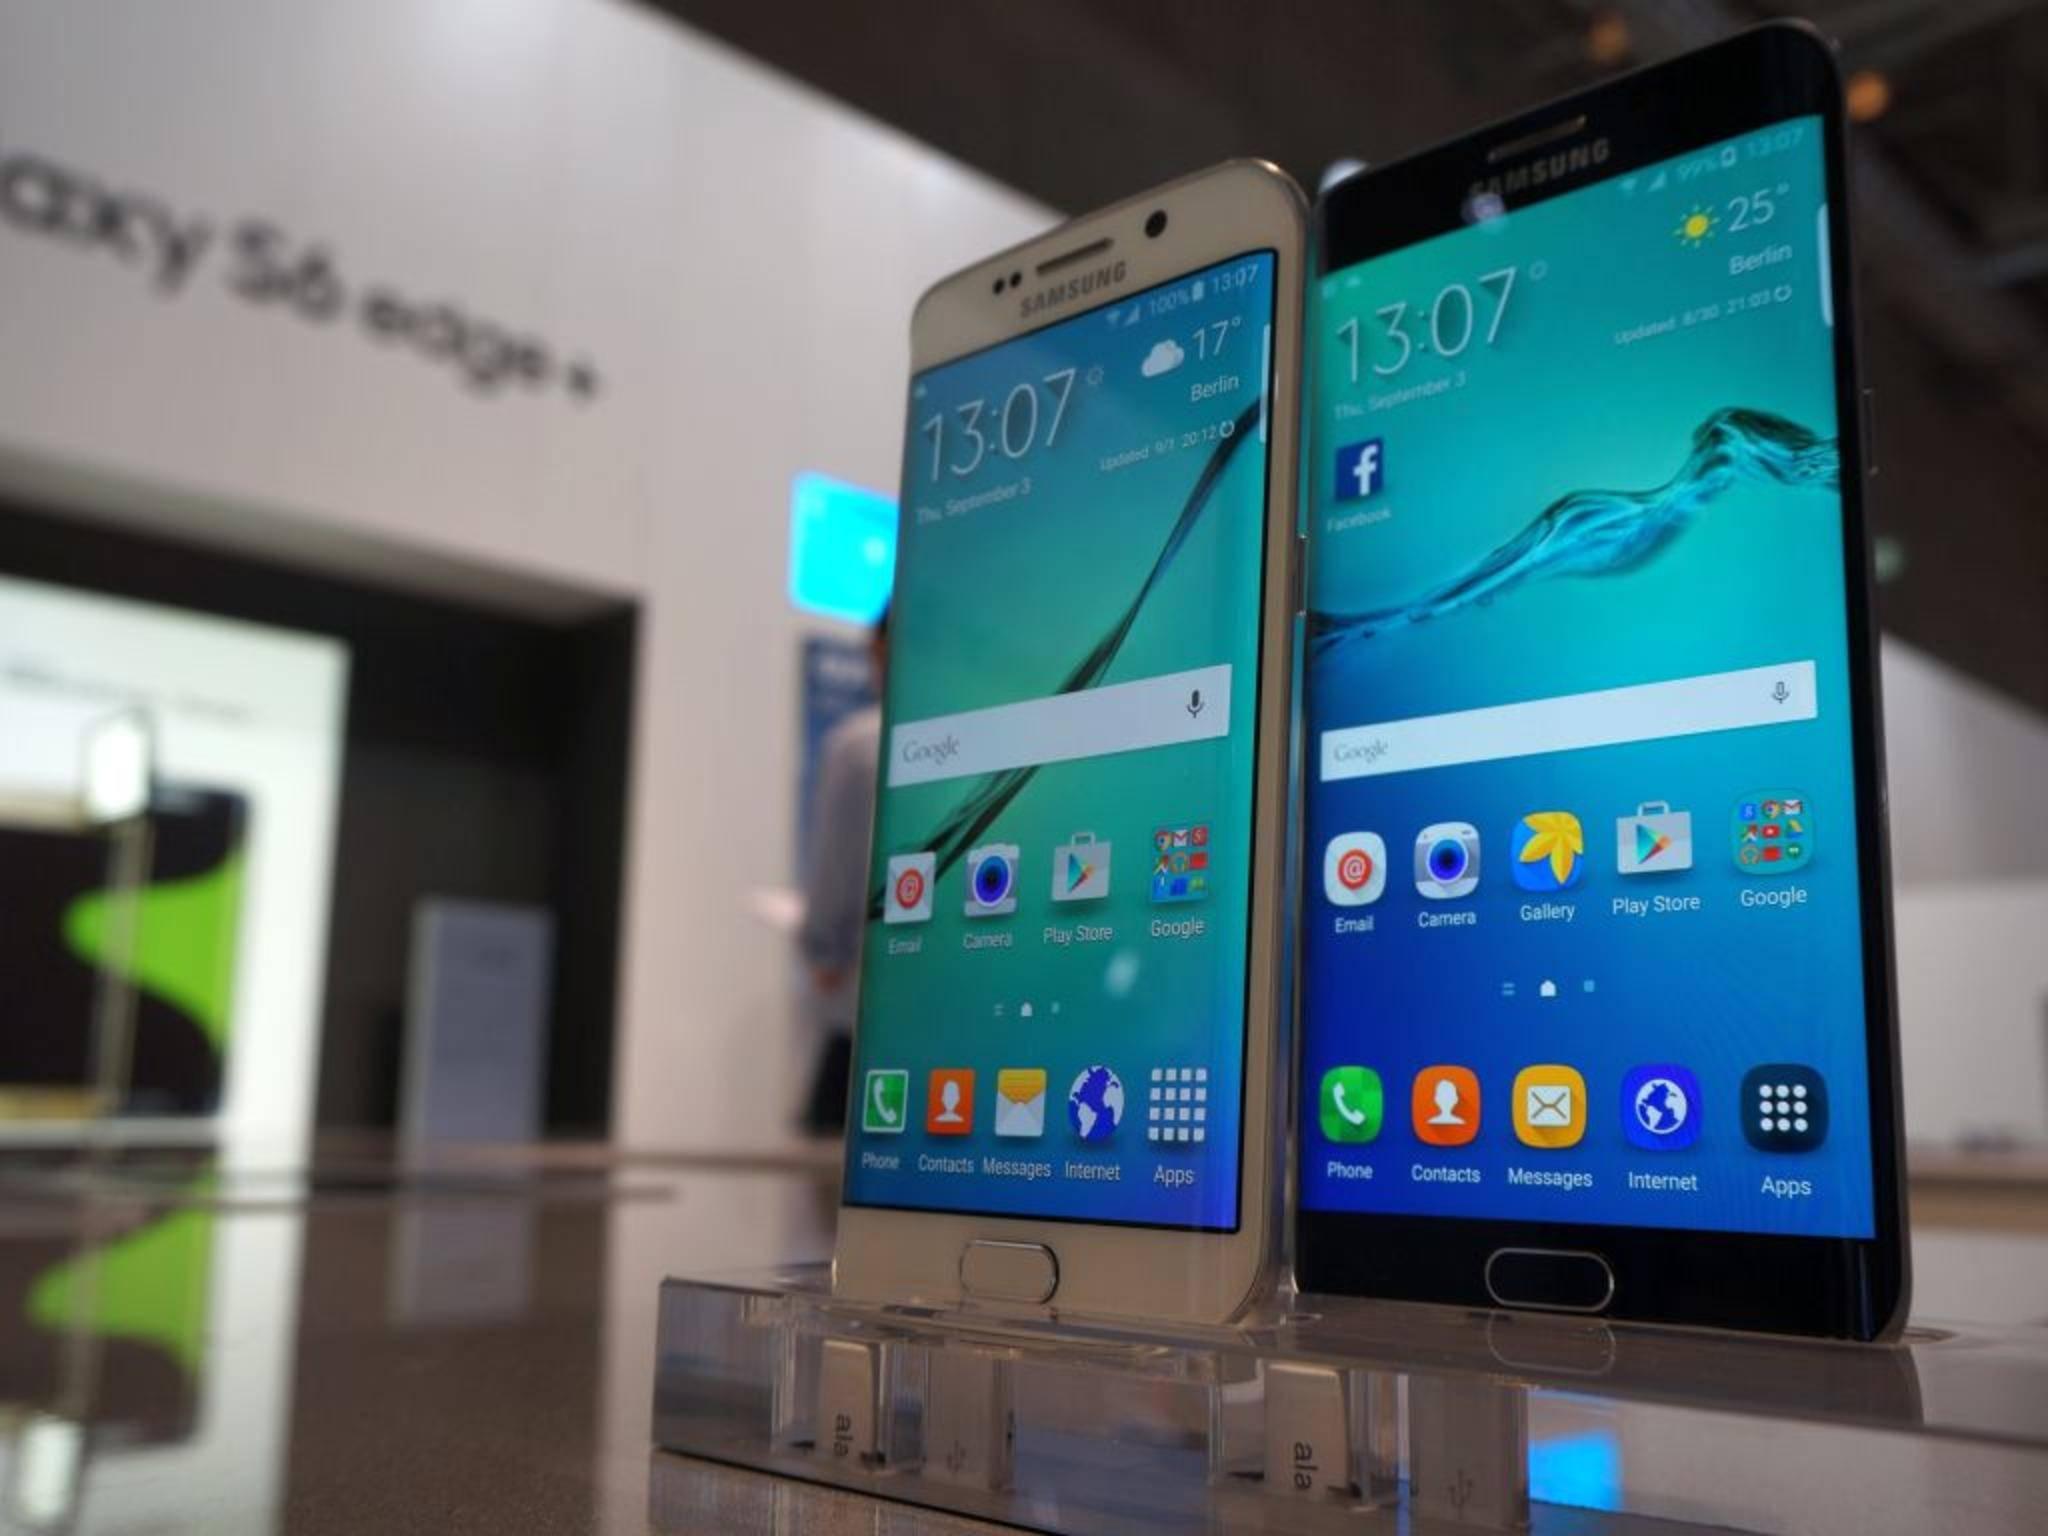 Samsung Galaxy S6 Edge+ 5